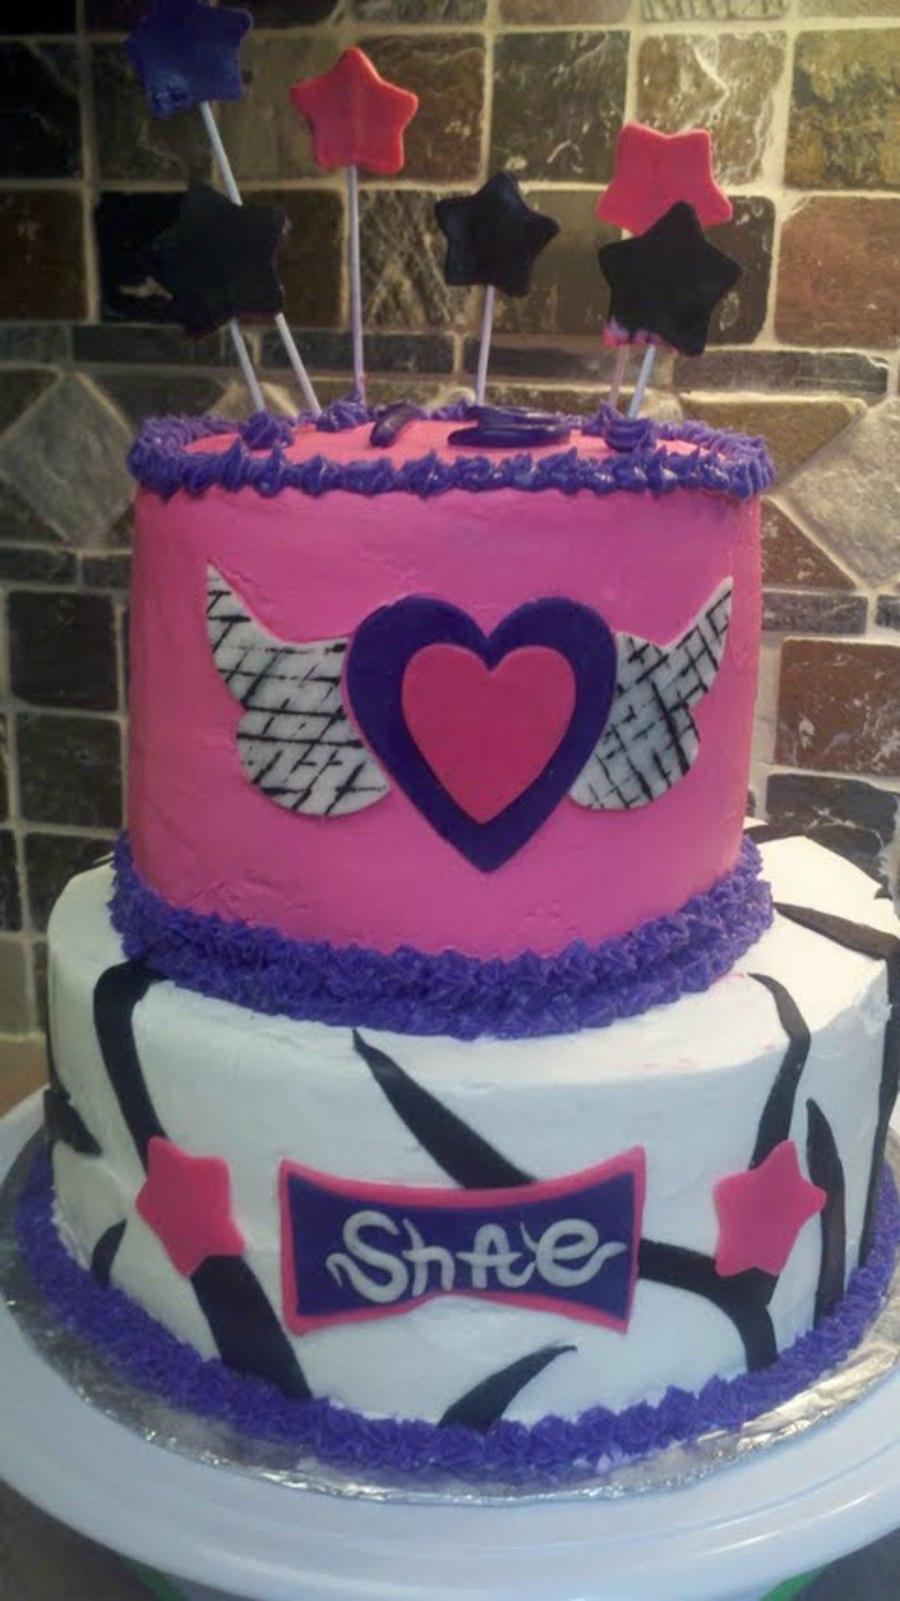 Remarkable Shaes Rock Star Birthday Cake Cakecentral Com Funny Birthday Cards Online Kookostrdamsfinfo